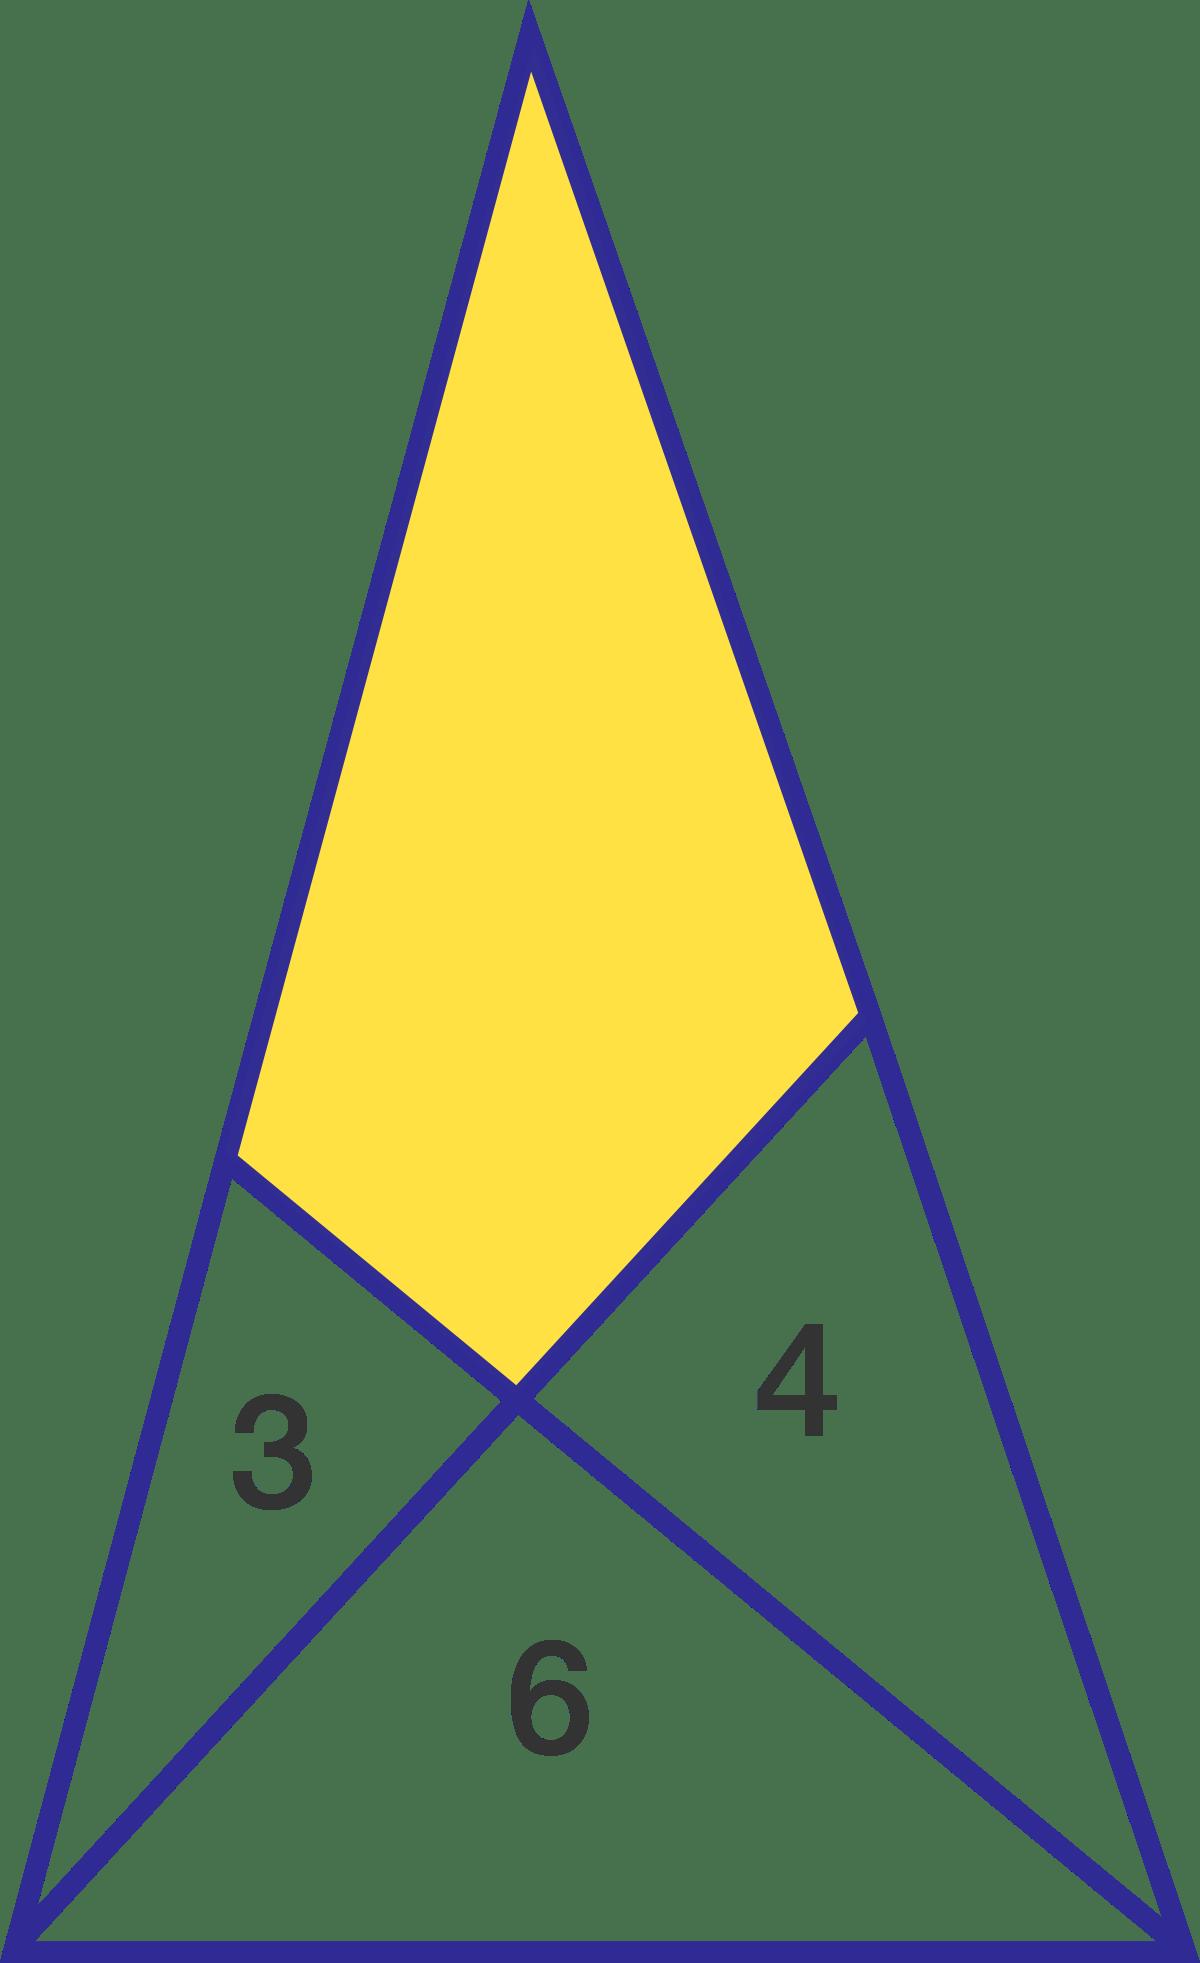 Quadrilaterals Level 4 Challenges Practice Problems